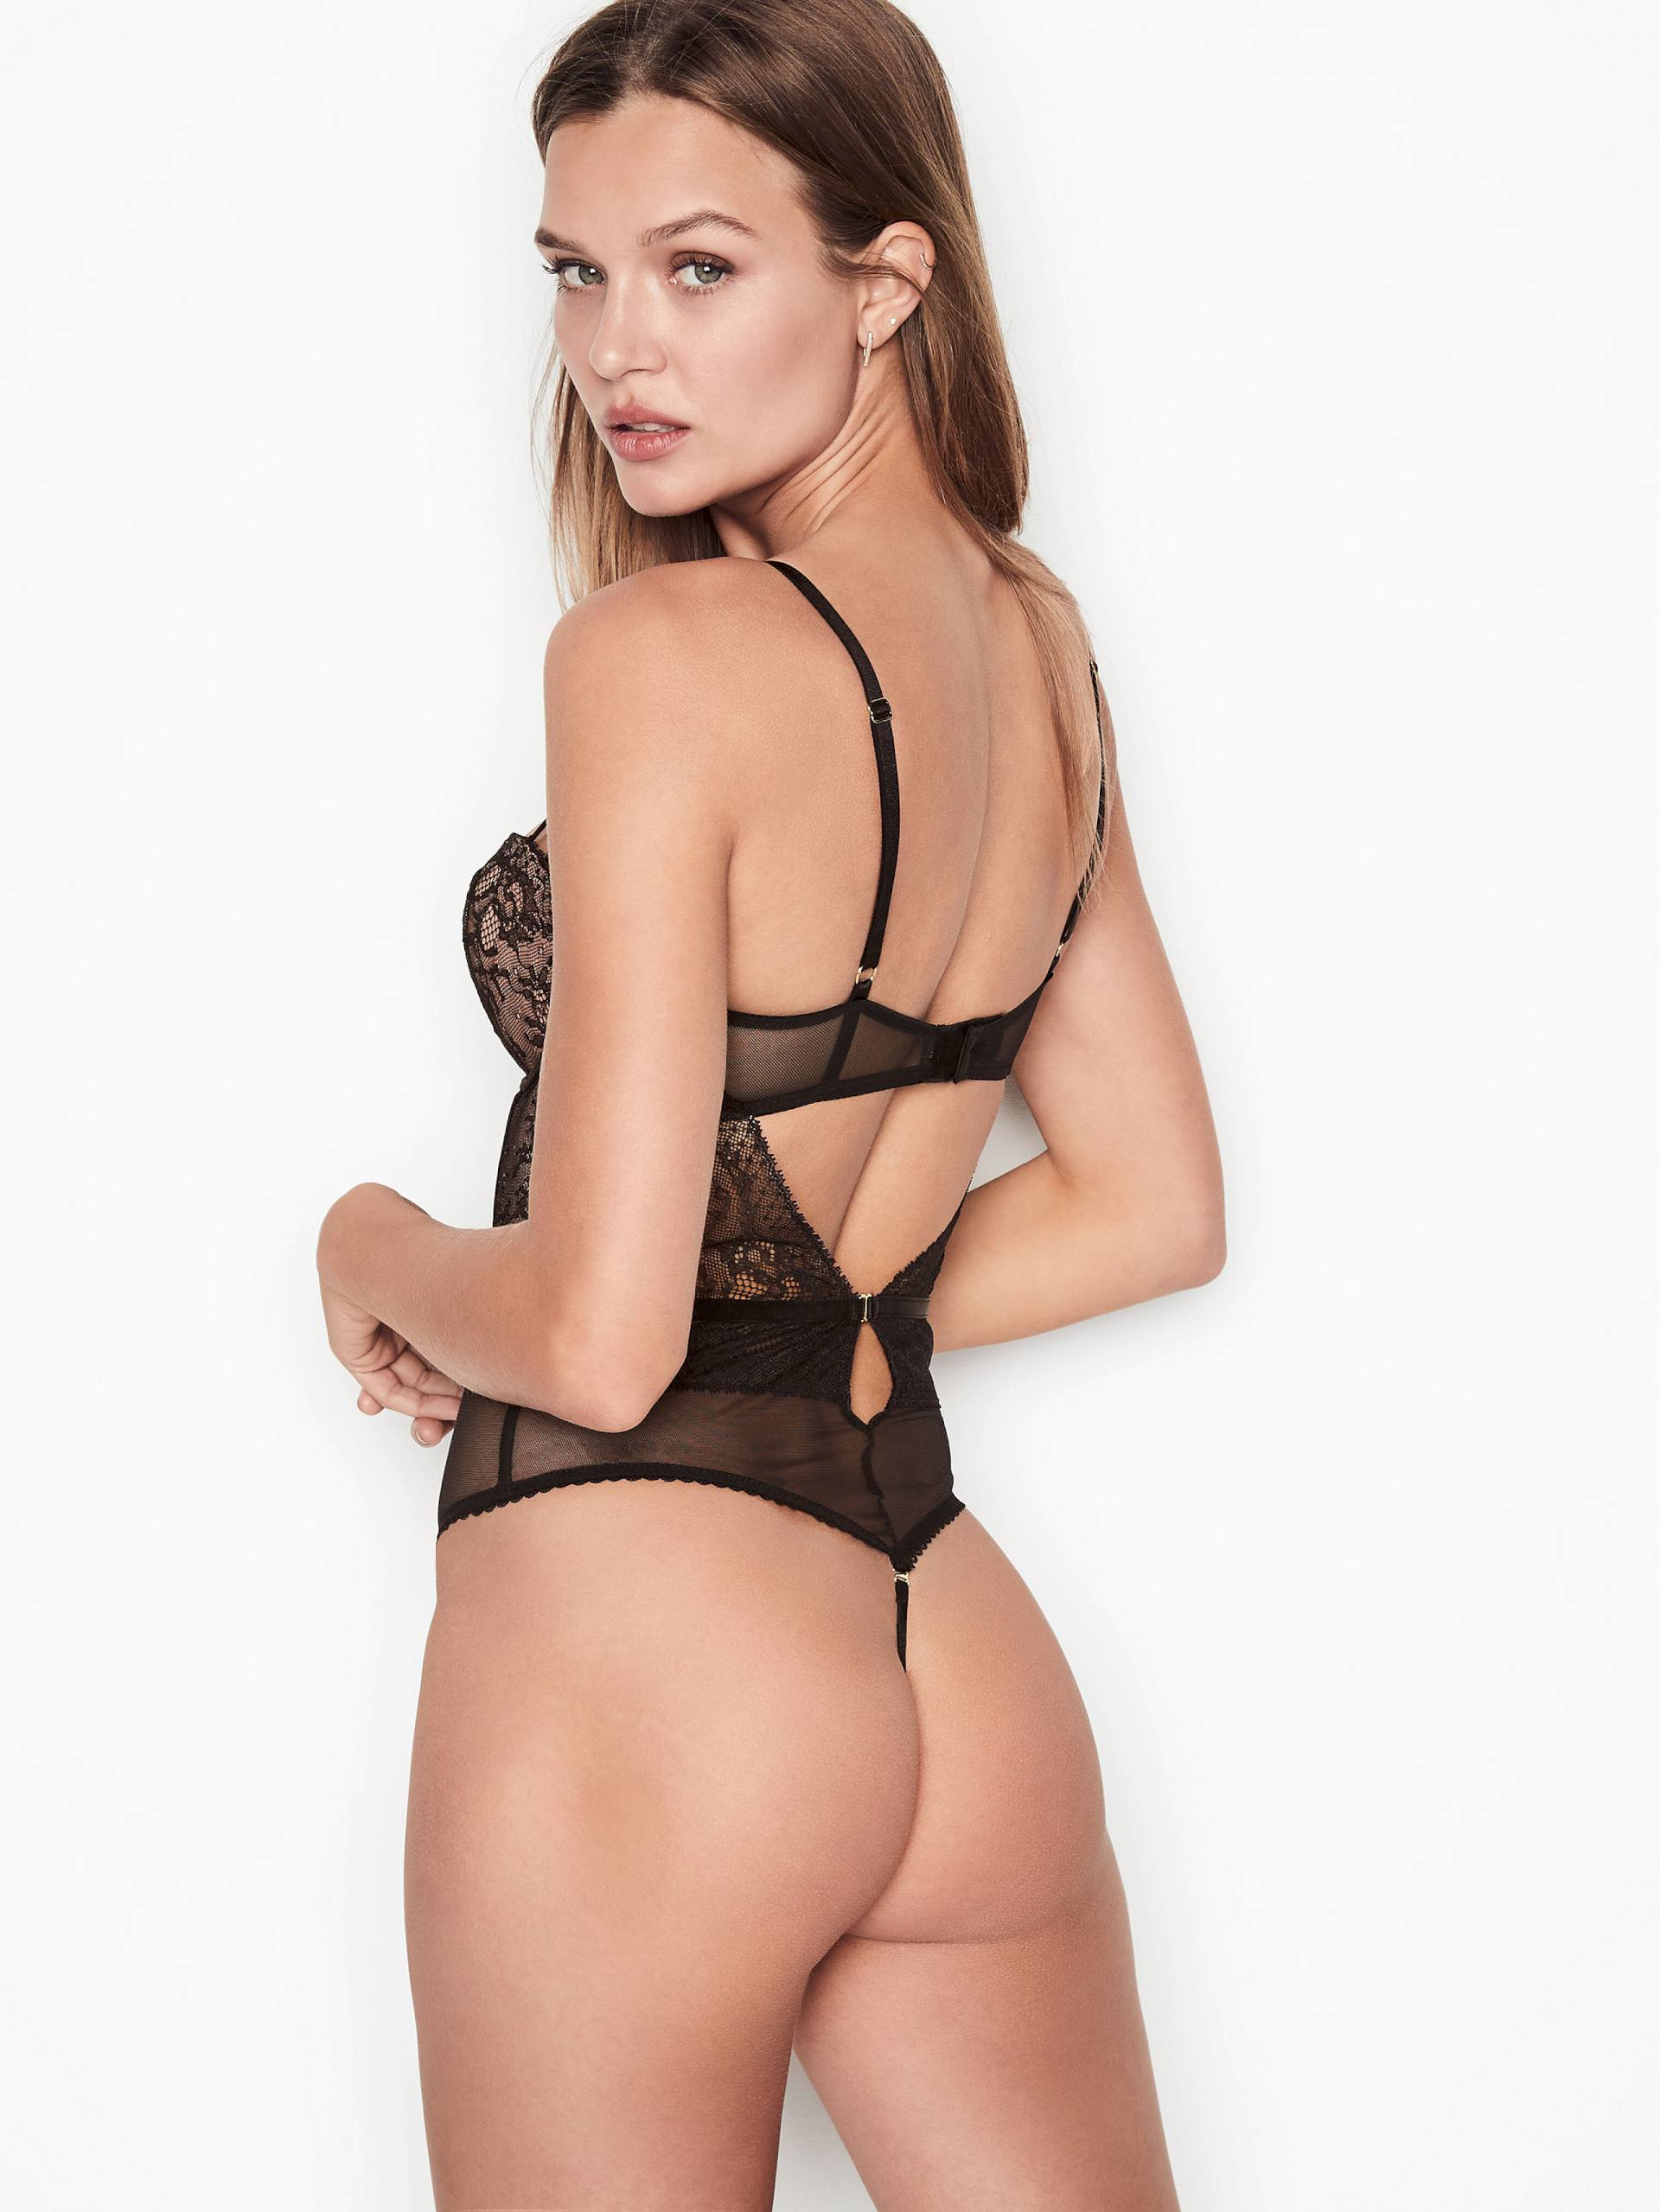 Josephine Skriver Sexy Lingerie Pics